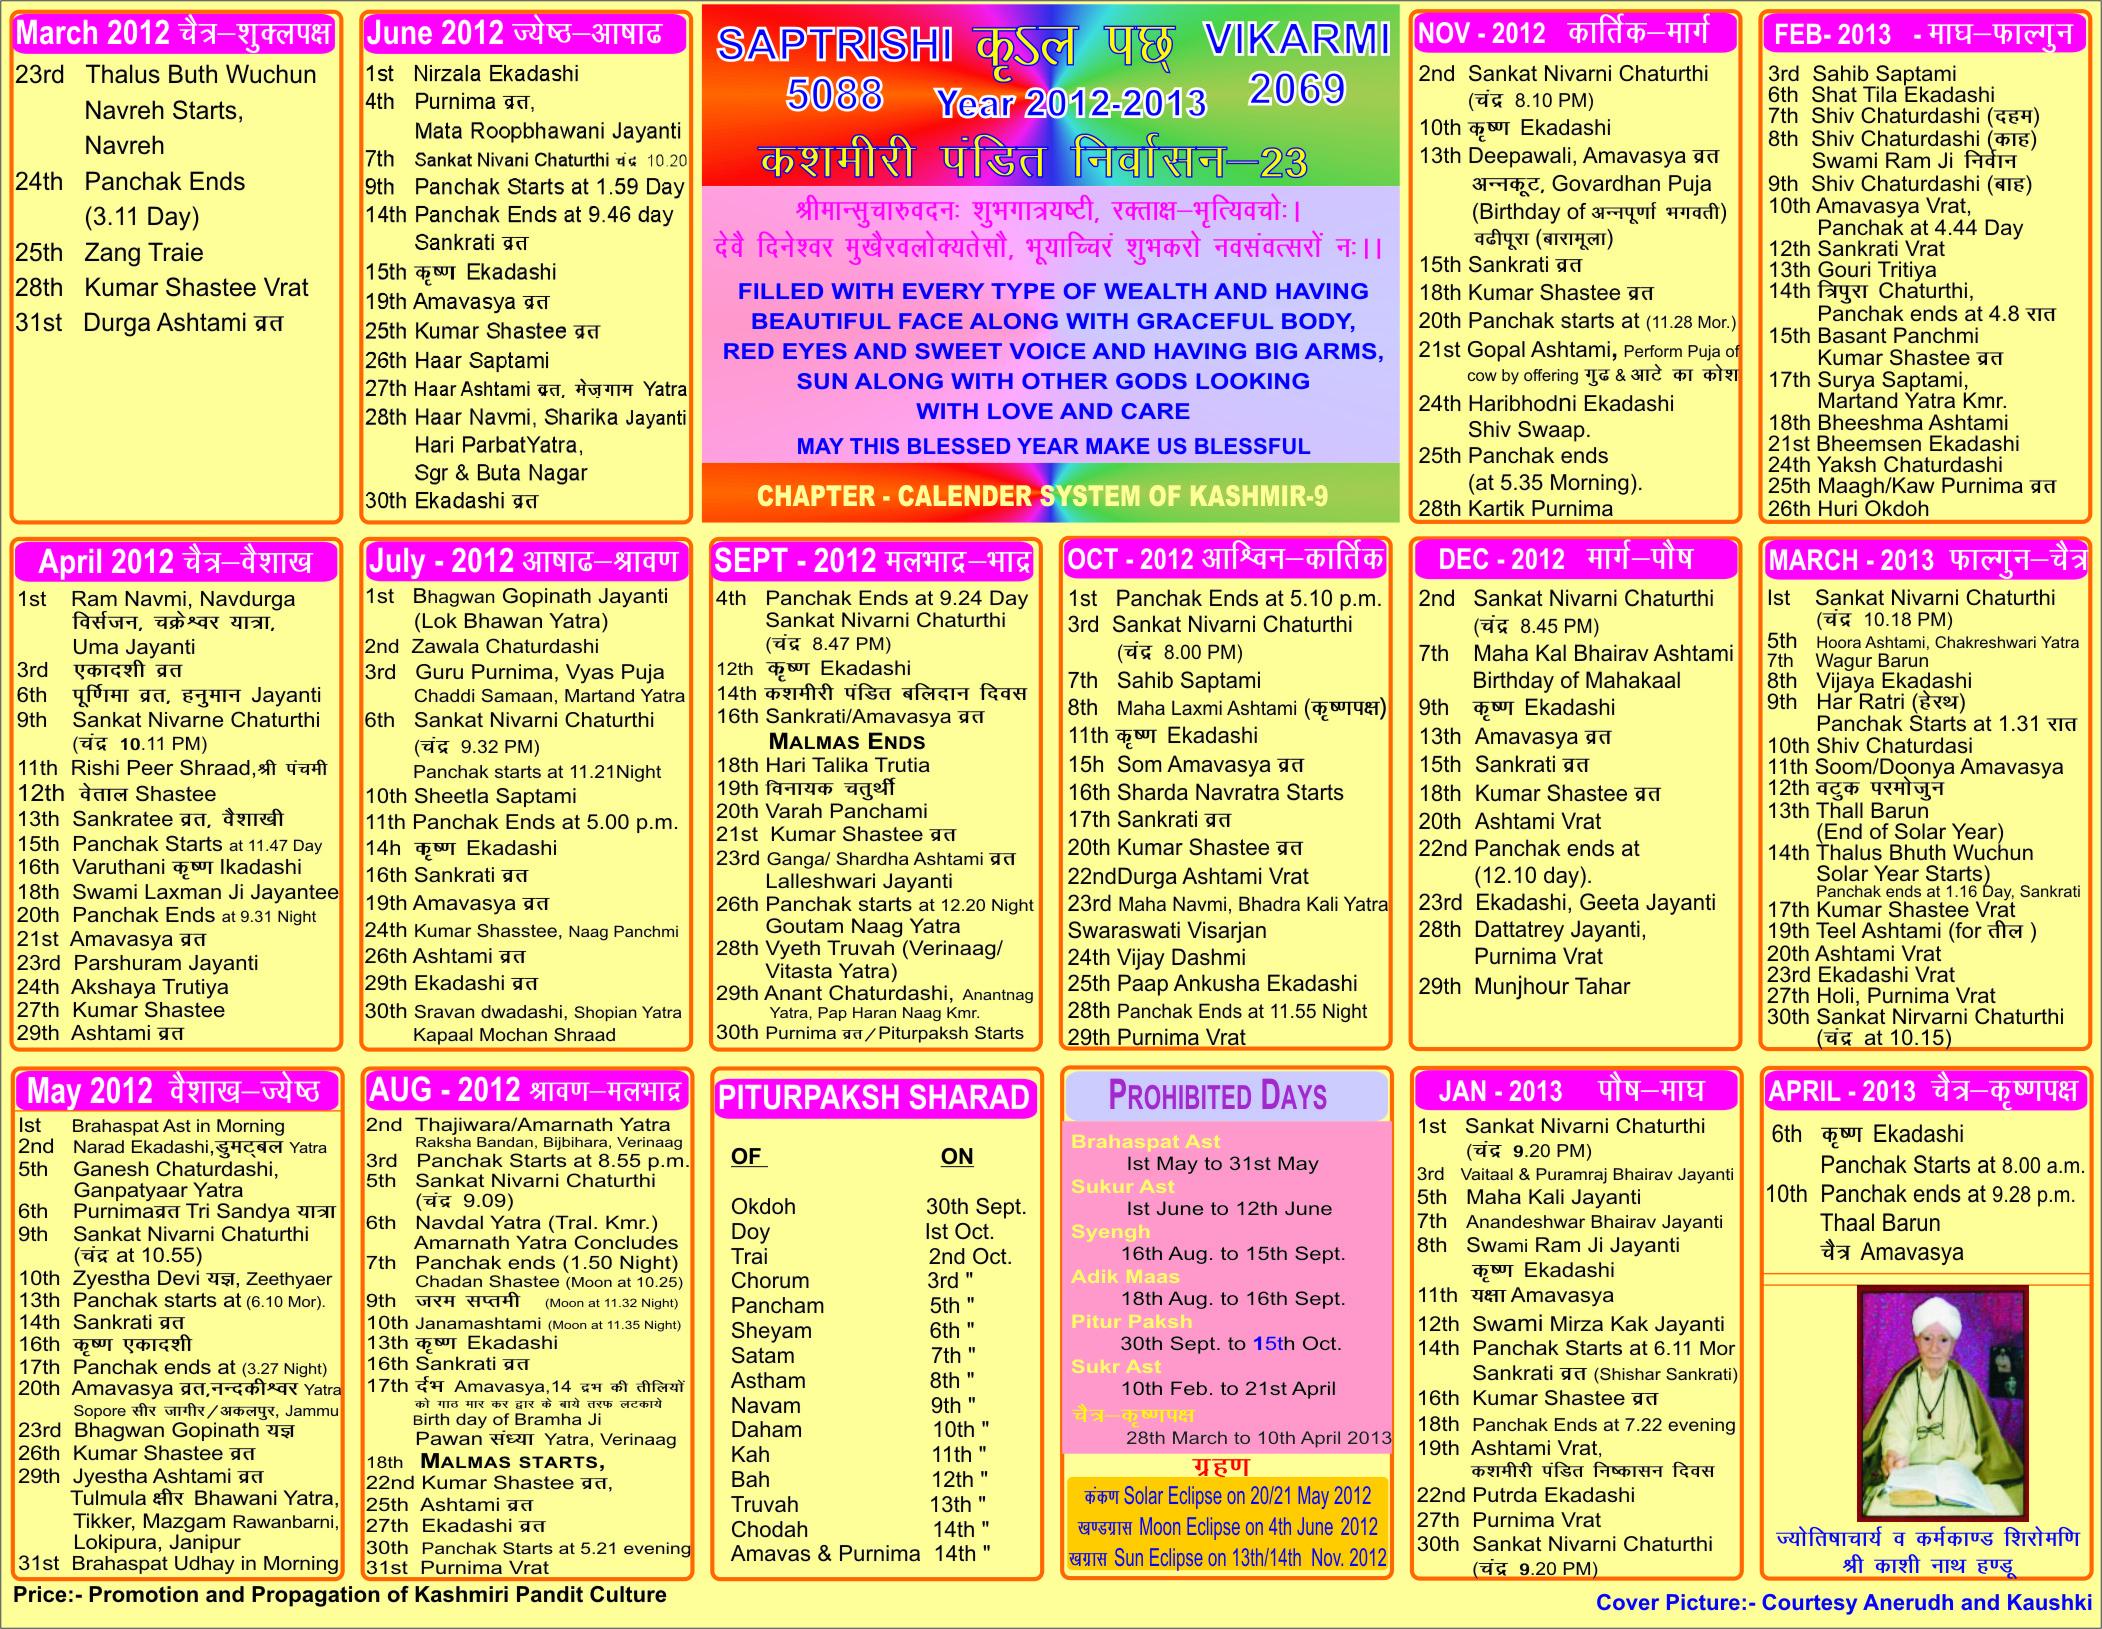 Koshur Update: Navreh 2012 Special regarding 1998 Calendar With Festivals